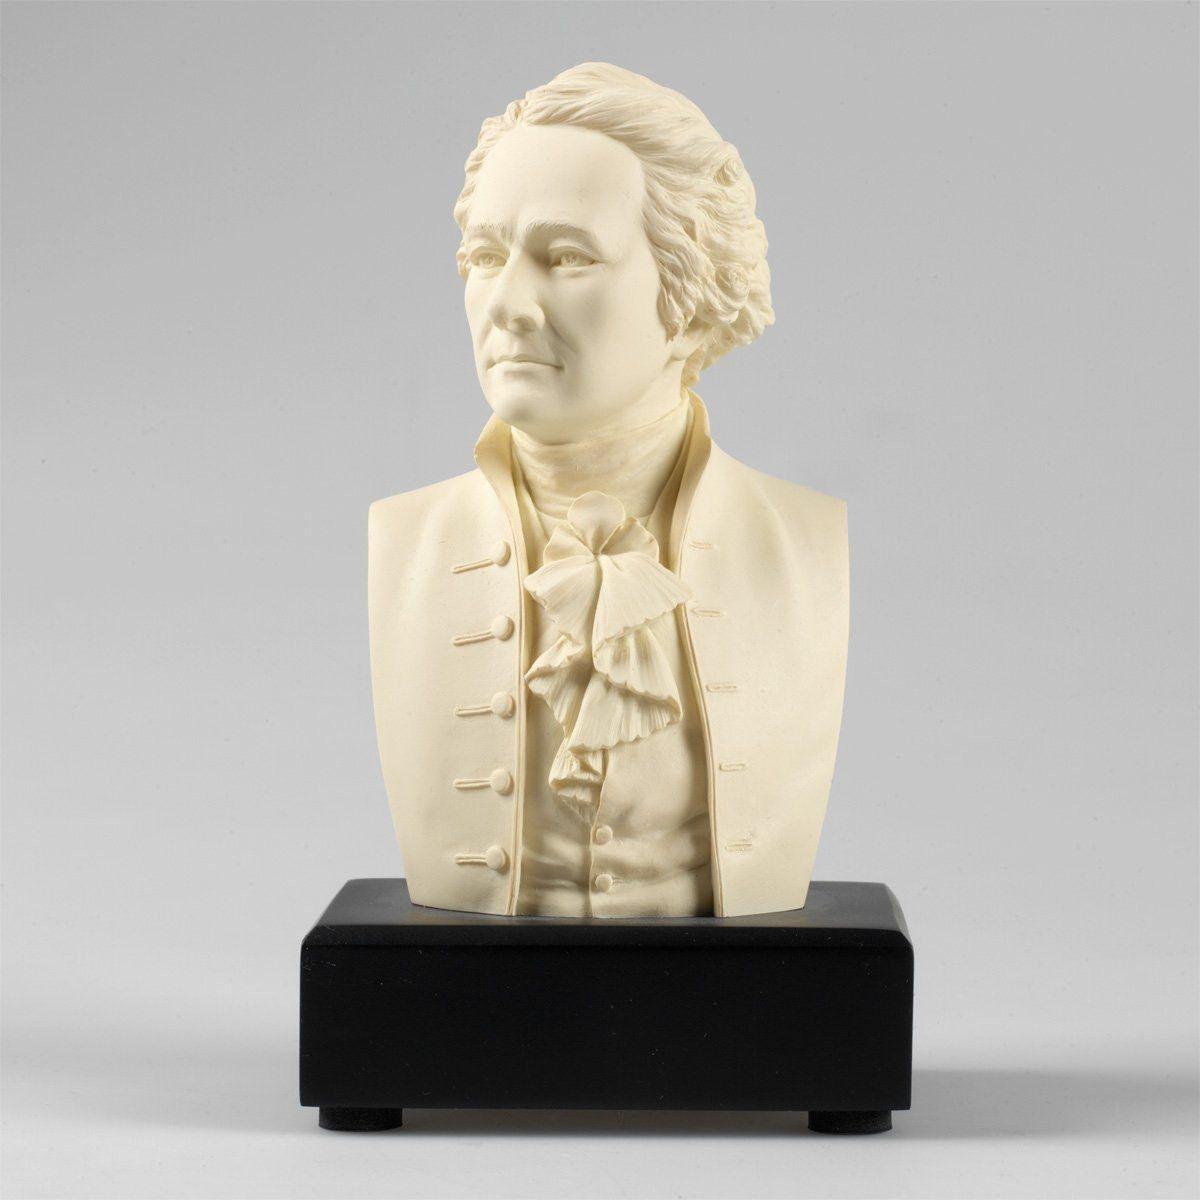 6-inch High Alexander Hamilton Bust Statue Sculpture in White Polystone